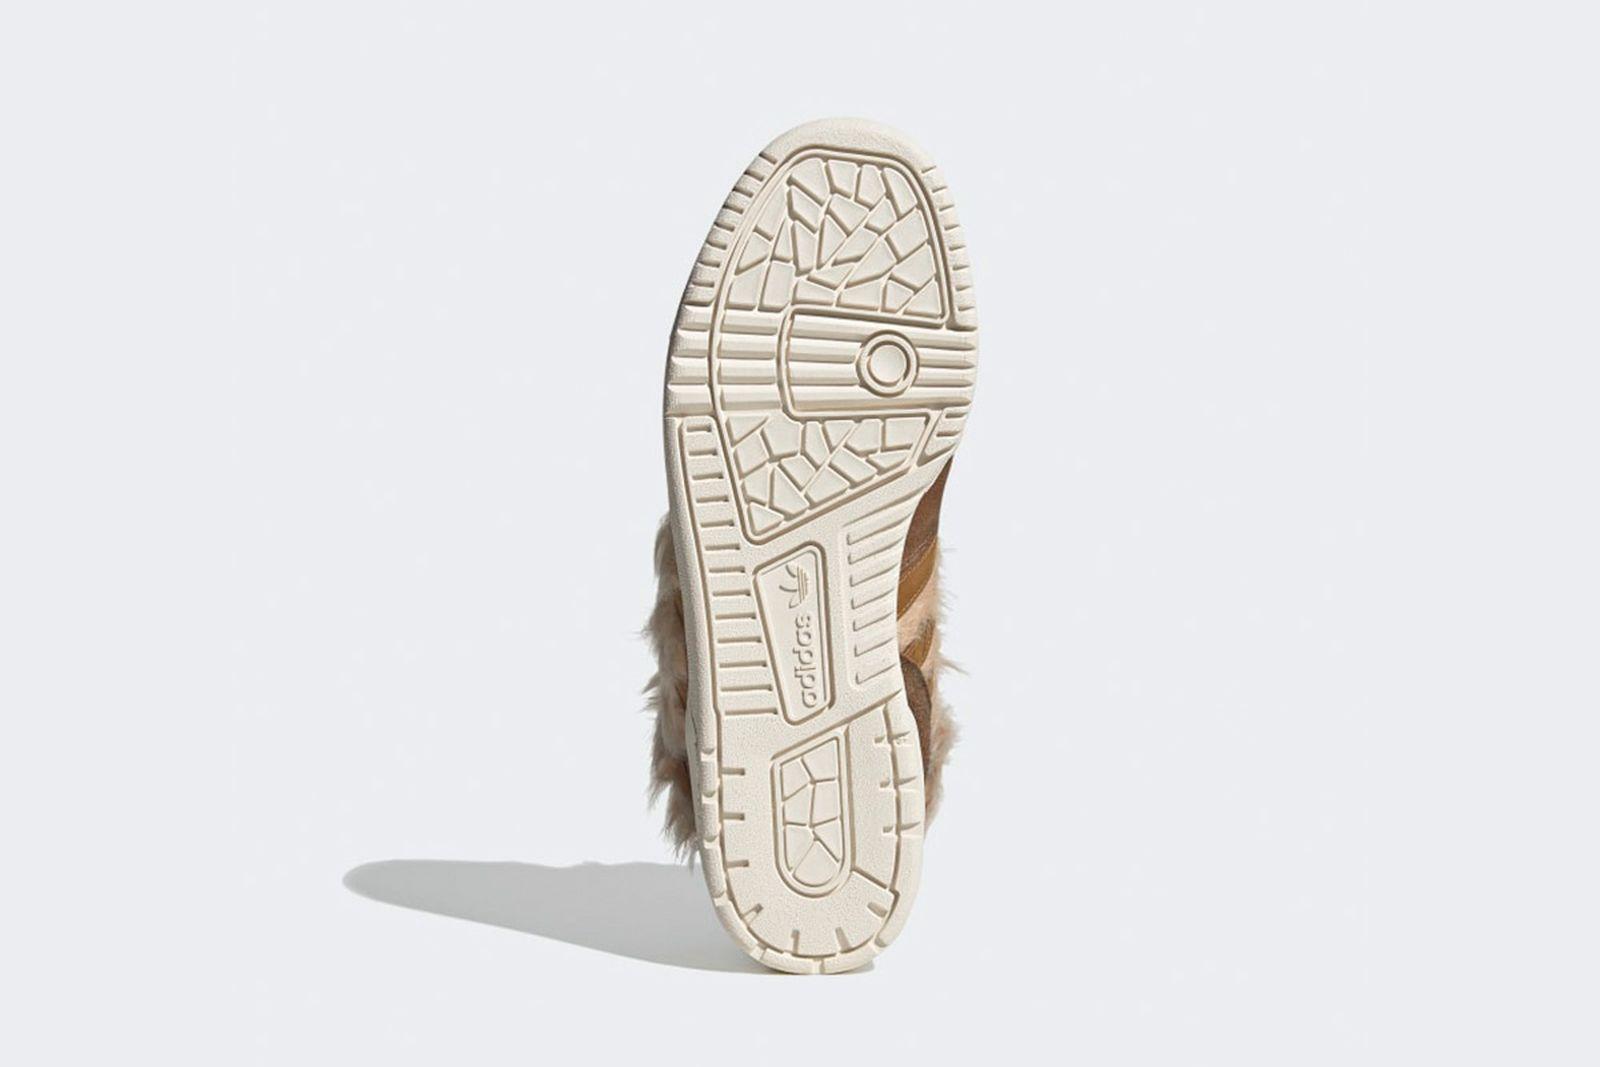 star-wars-adidas-rivalry-hi-chewbacca-release-date-price-02